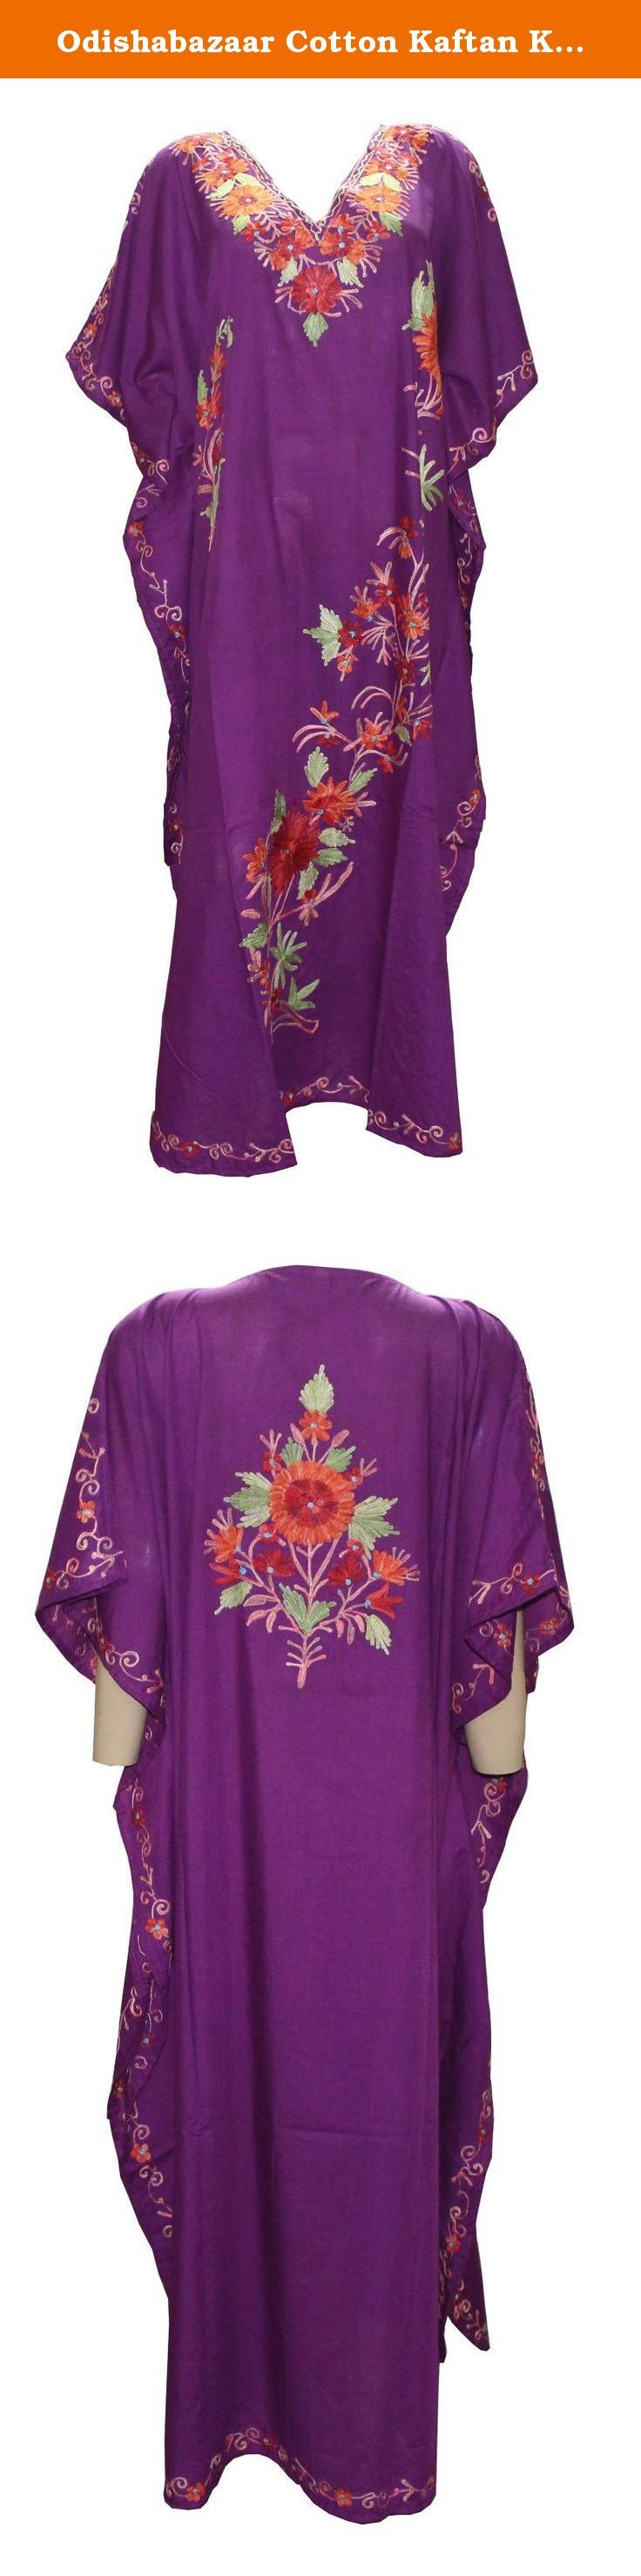 Odishabazaar Cotton Kaftan Kashmiri Embroidered Maxi Long Dress for Women (multi-2). Long length Kashmiri Kaftan/lounge wear/beach wear/ maxi dress with Ari Embroidered Flowers.